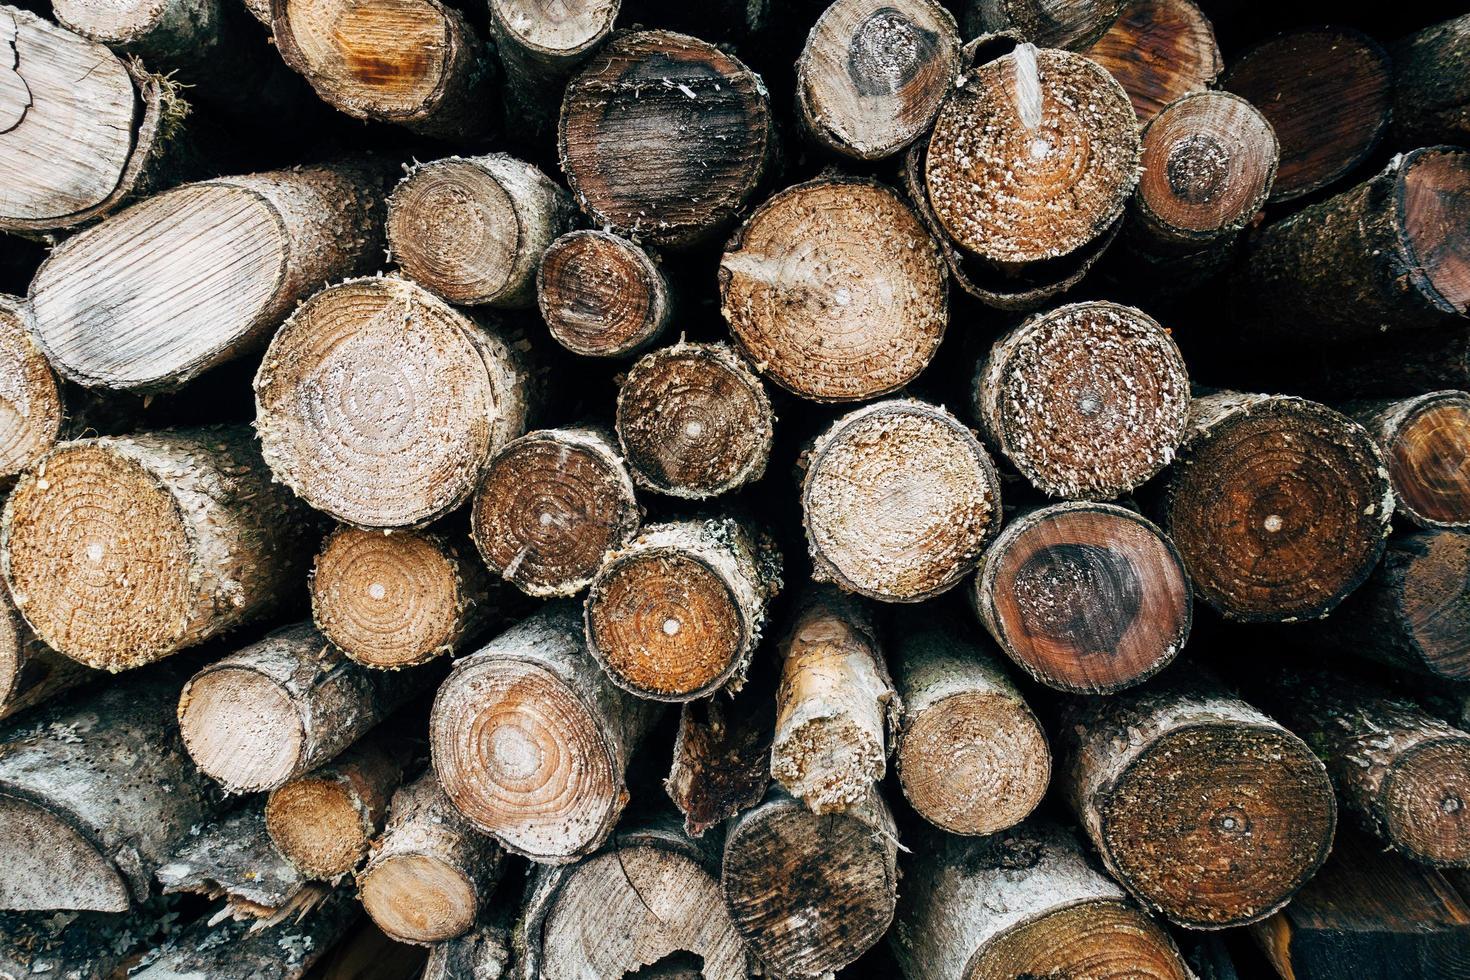 Pile of wood logs photo